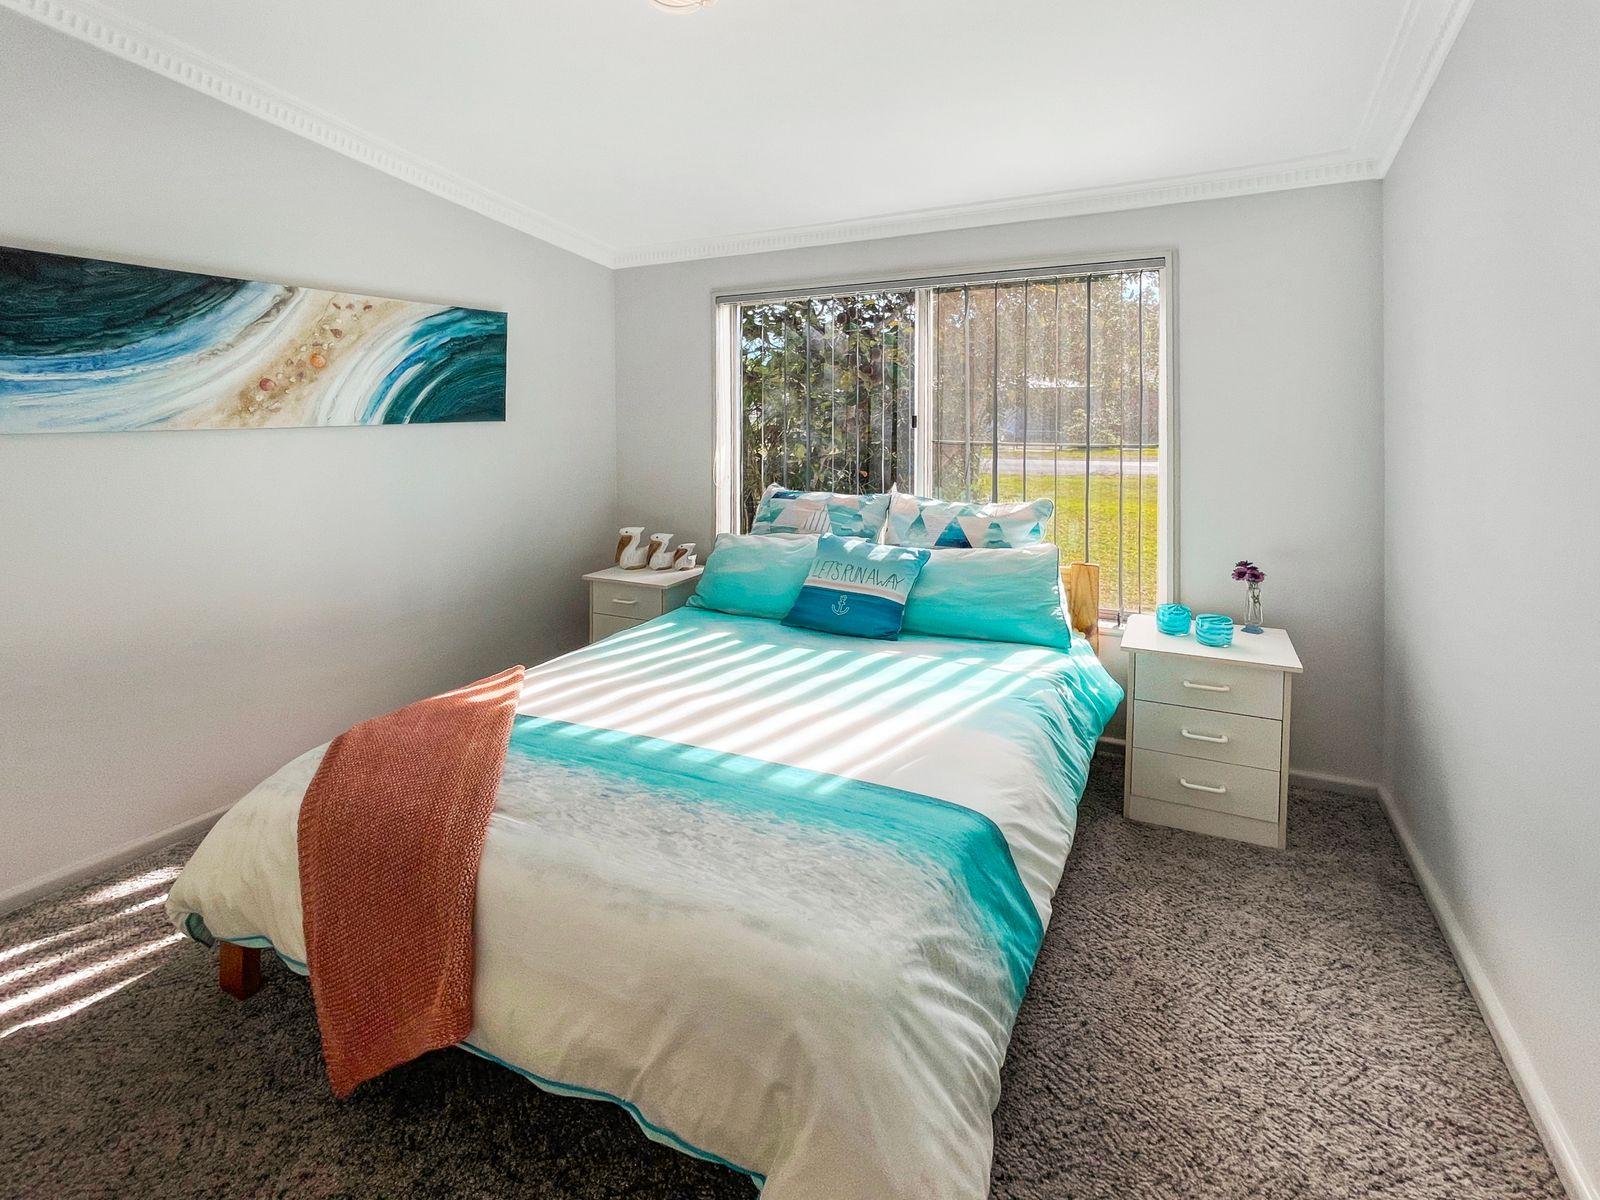 28 Mermaid Avenue, Hawks Nest, NSW 2324